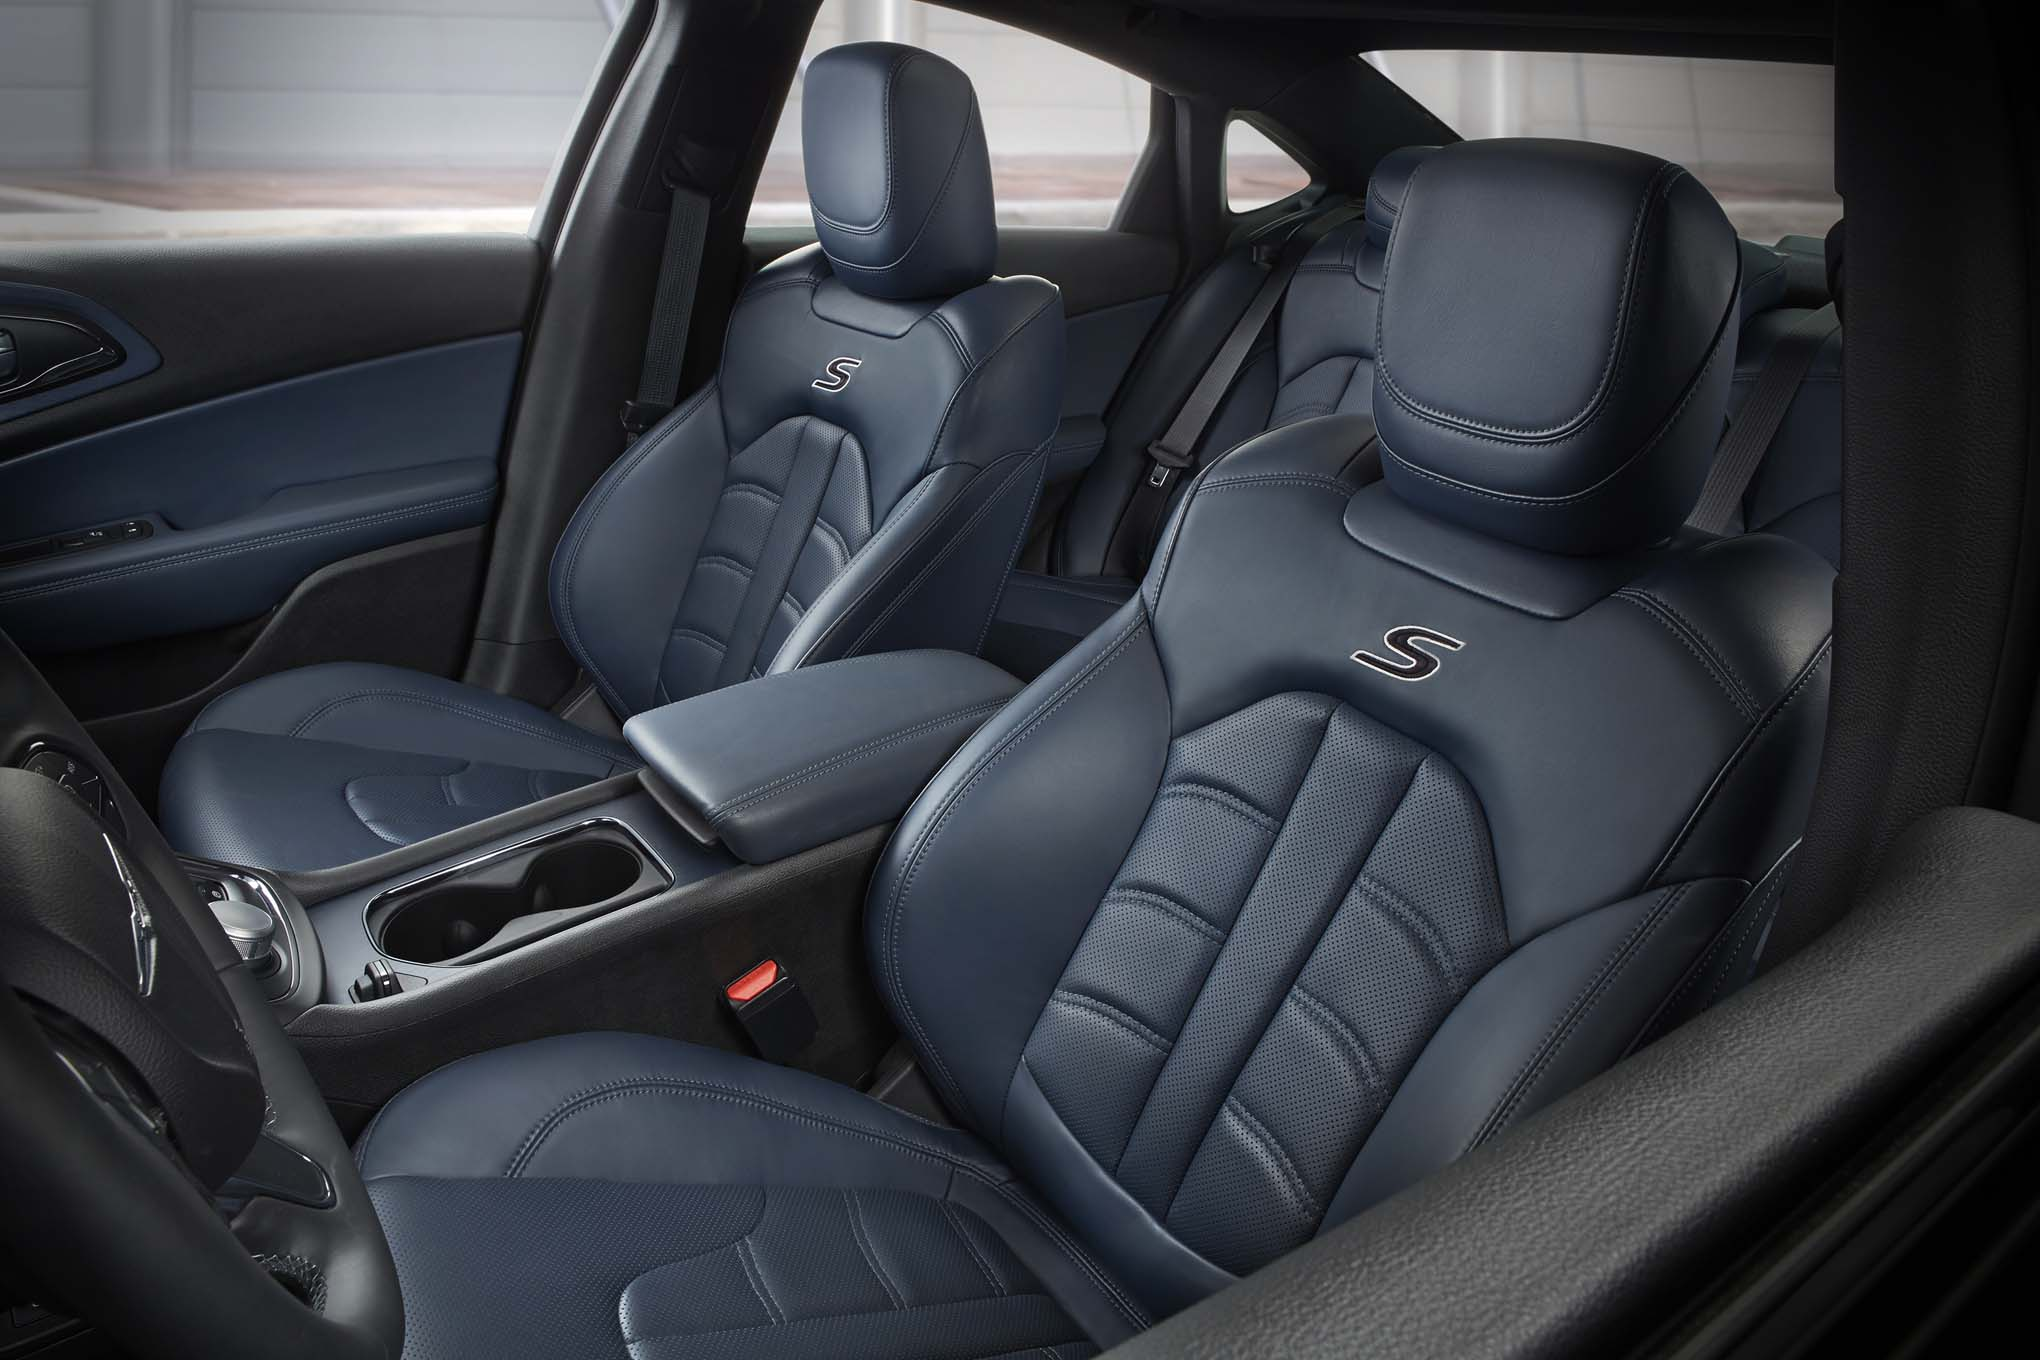 2017 Chrysler 200 Ambador Blue Leather Interior